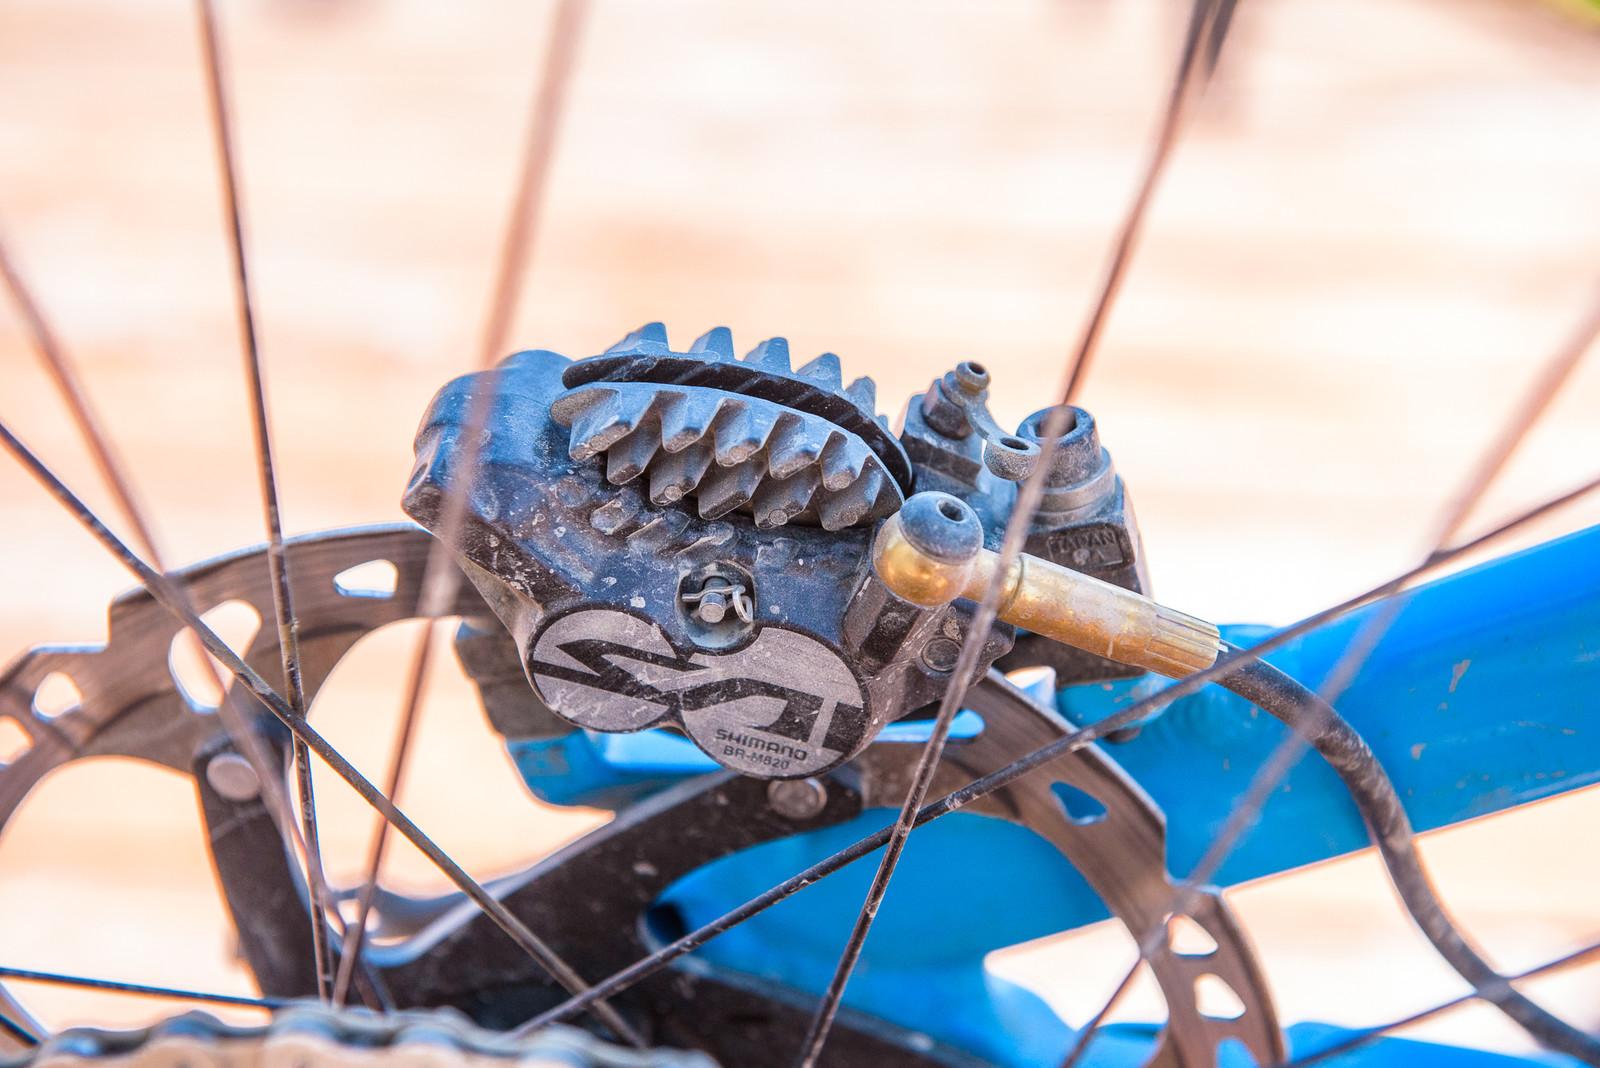 Shimano Saint Brakes - Pro Bike - Wyn Masters' GT Force, Size XL - Mountain Biking Pictures - Vital MTB